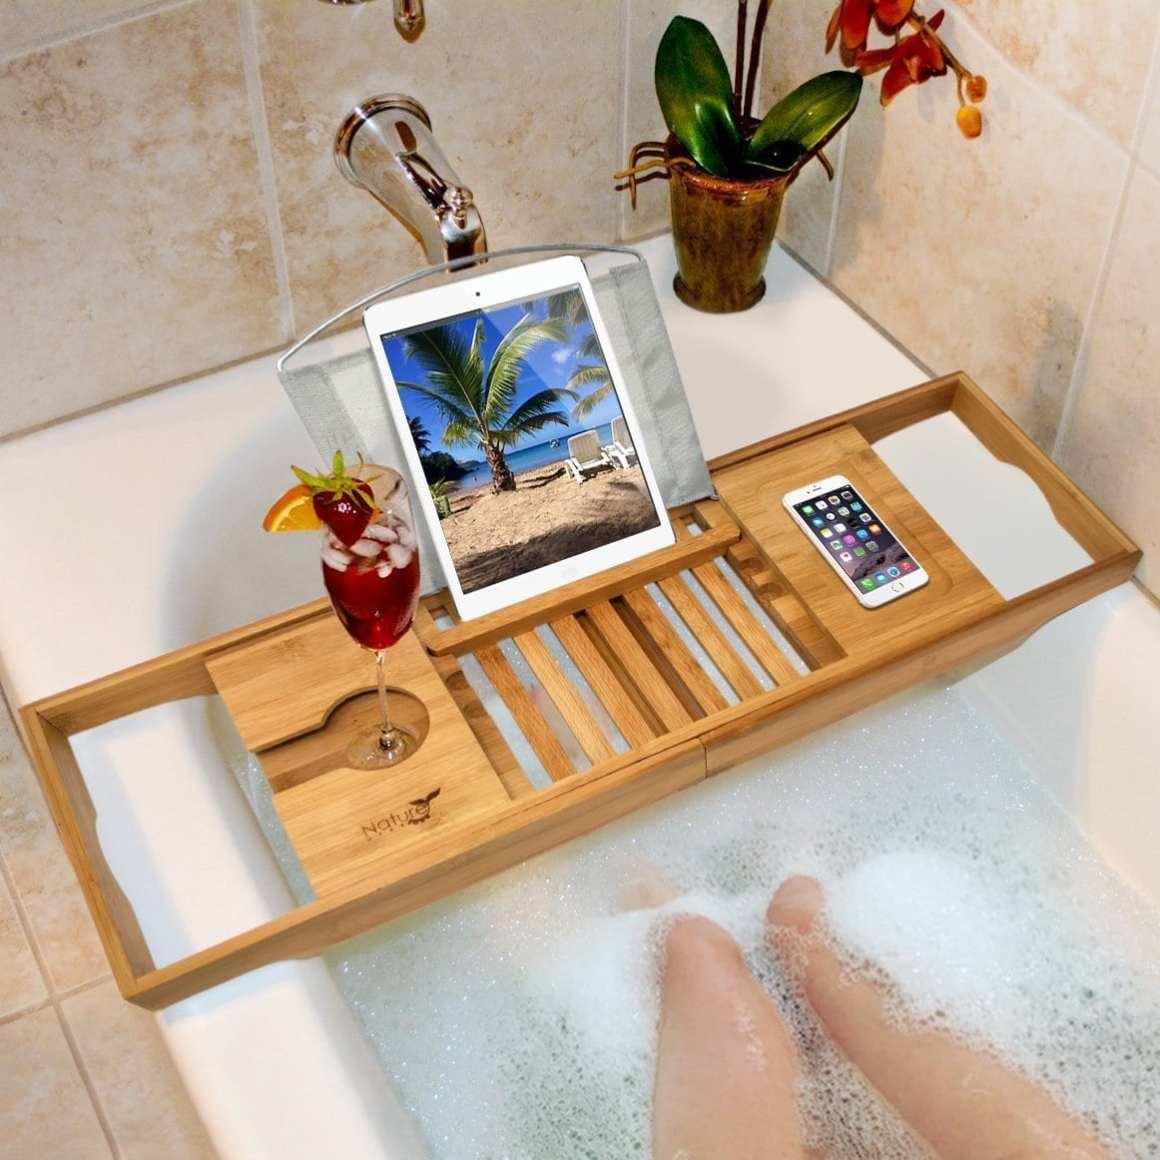 cozy home bathcaddy